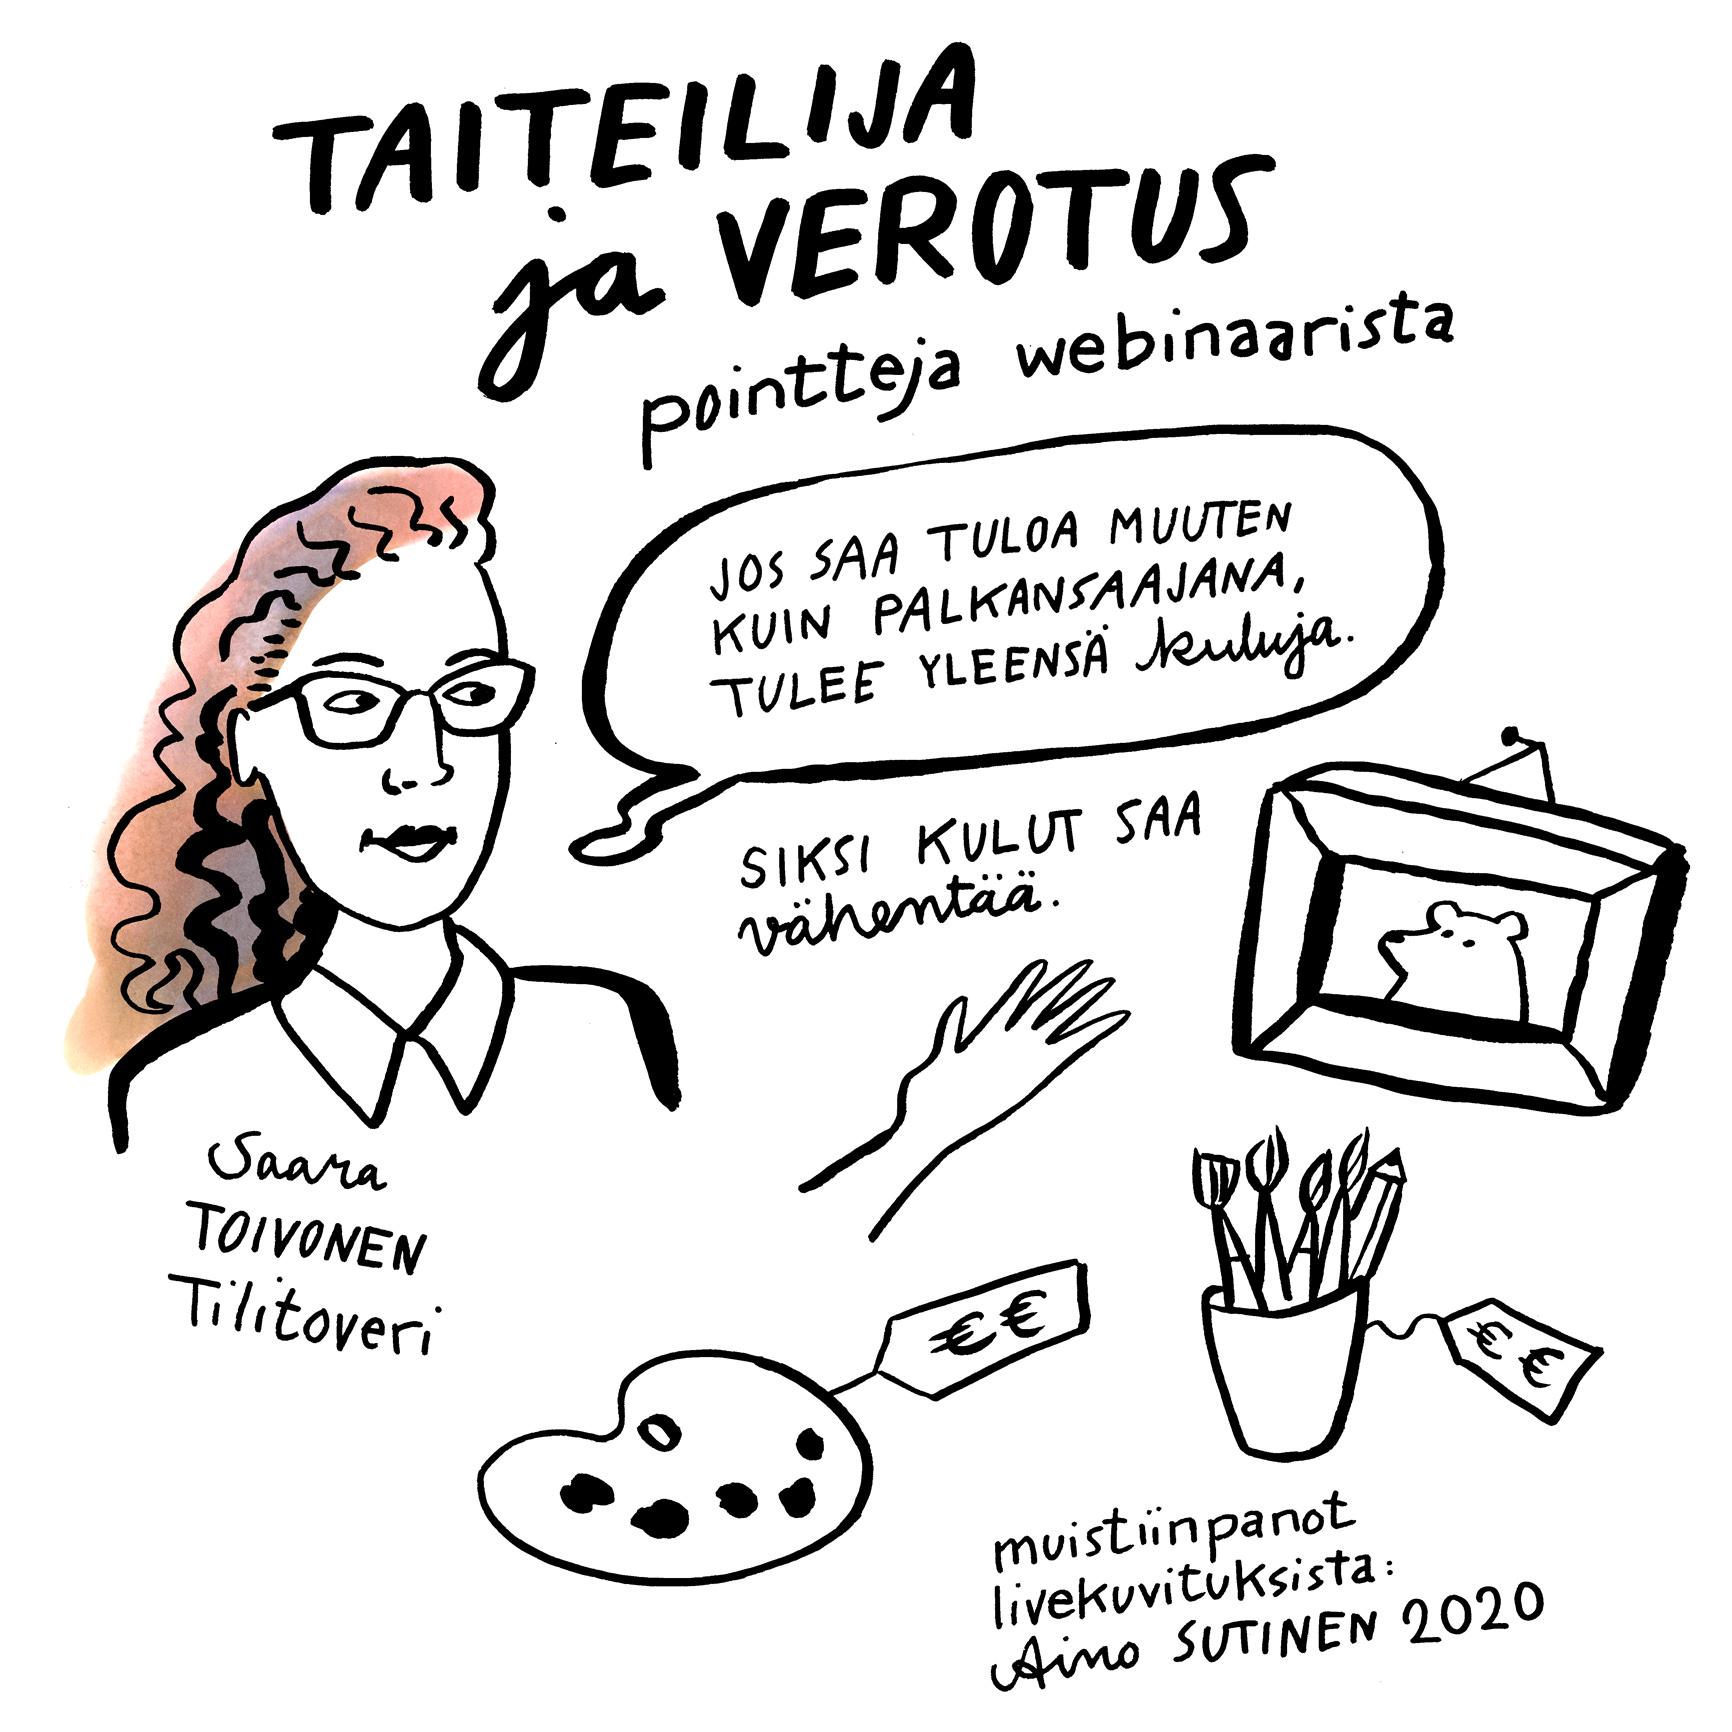 verotuswebinaari01web